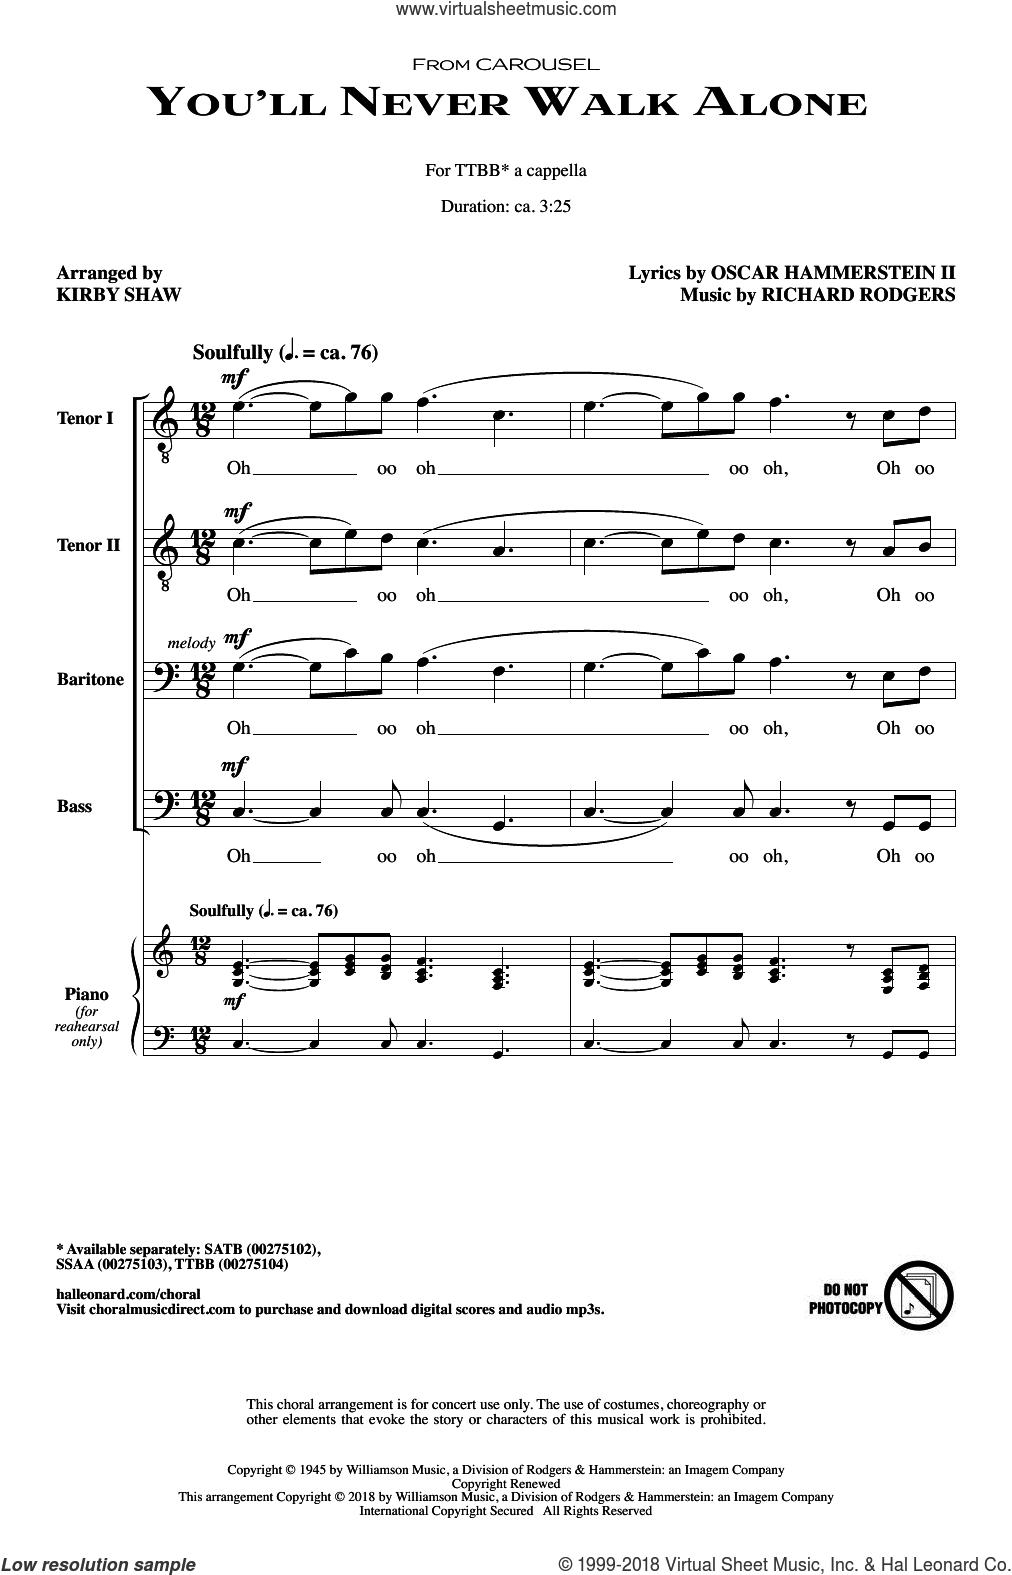 You'll Never Walk Alone sheet music for choir (TTBB: tenor, bass) by Richard Rodgers, Kirby Shaw and Oscar II Hammerstein, intermediate skill level